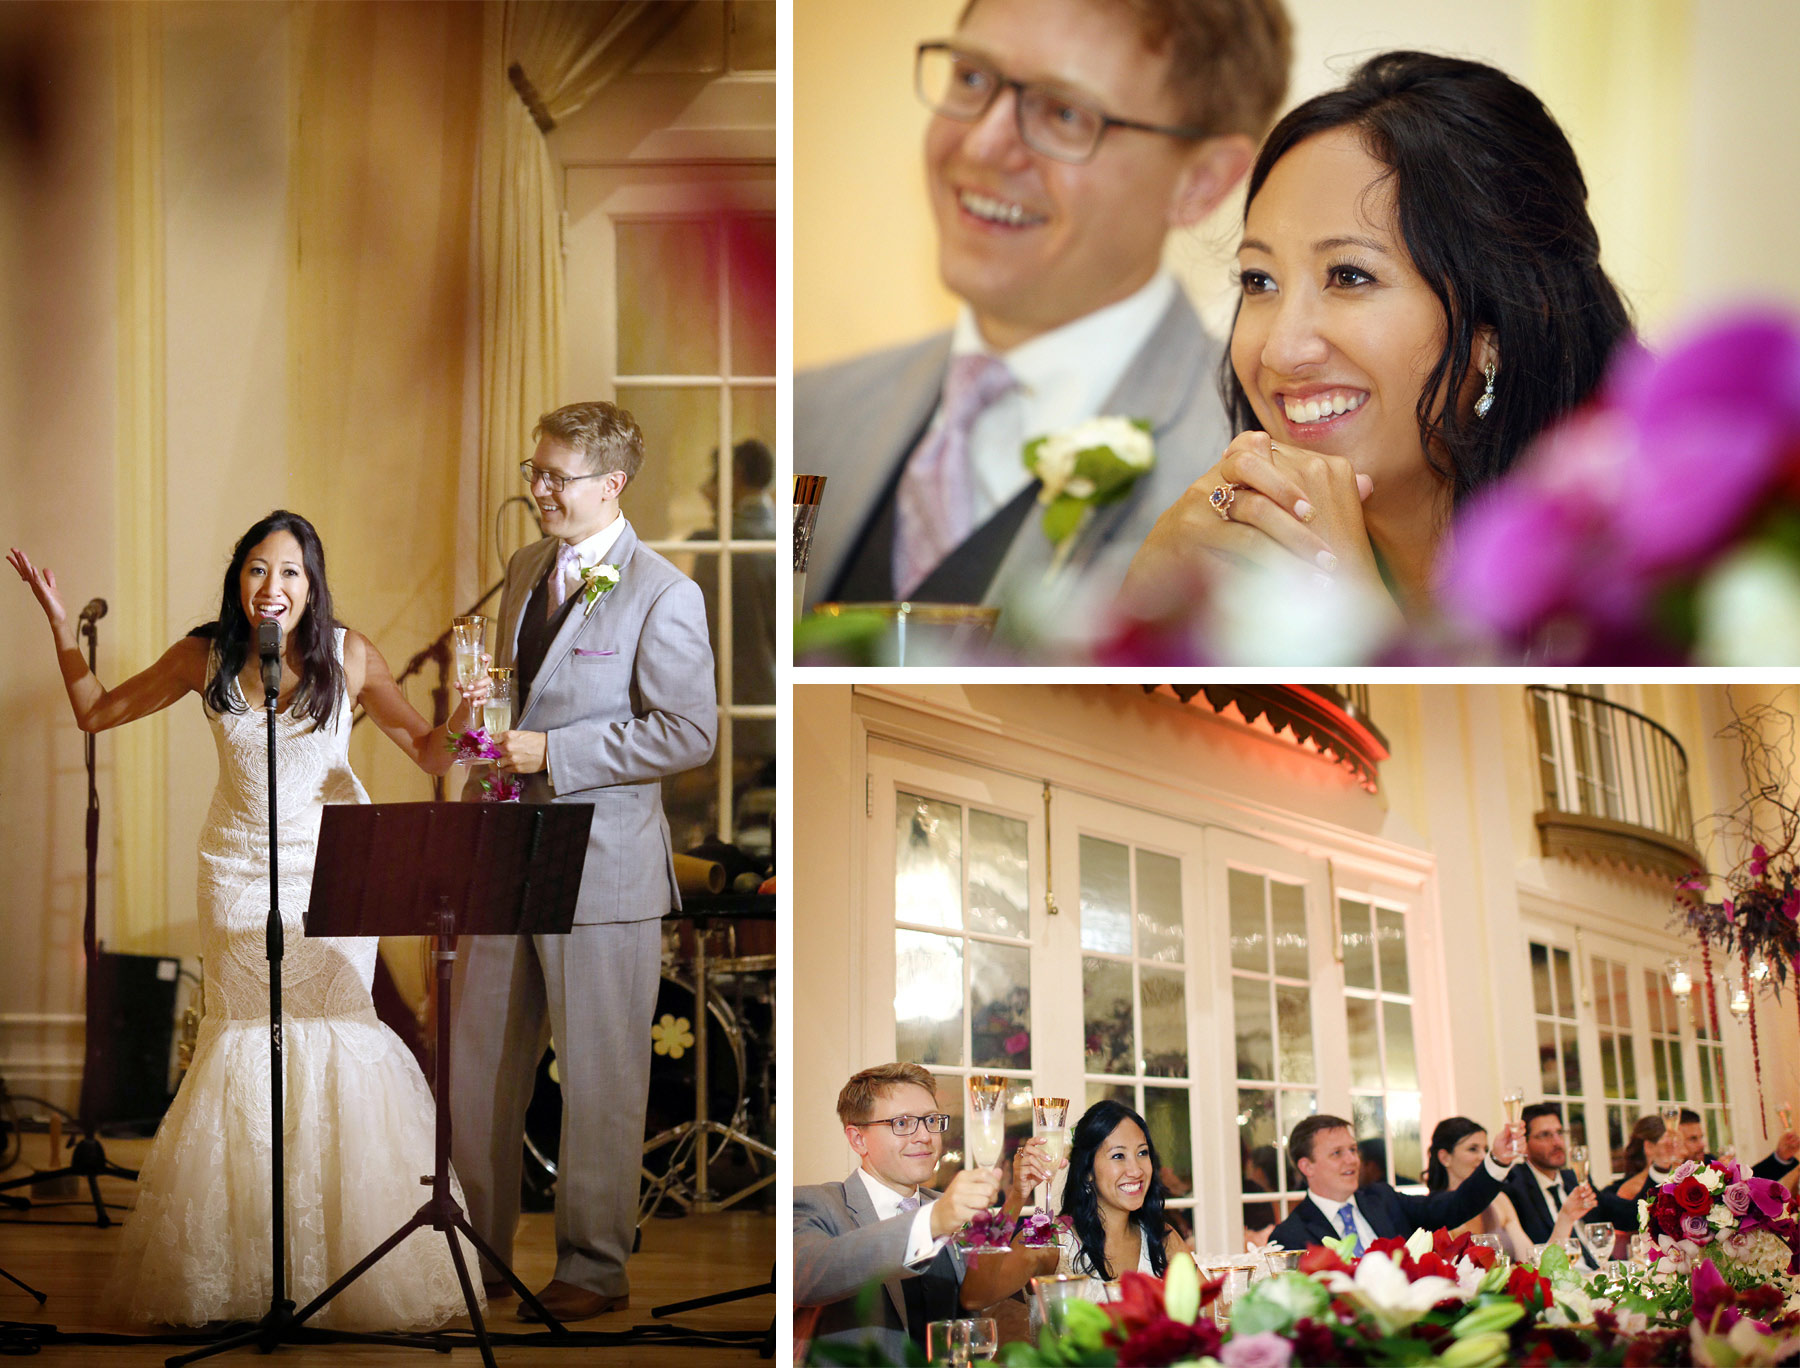 14-Minneapolis-Minnesota-Wedding-Photography-by-Vick-Photography-Lafayette-Country-Club-Reception-Daphne-&-Austin.jpg